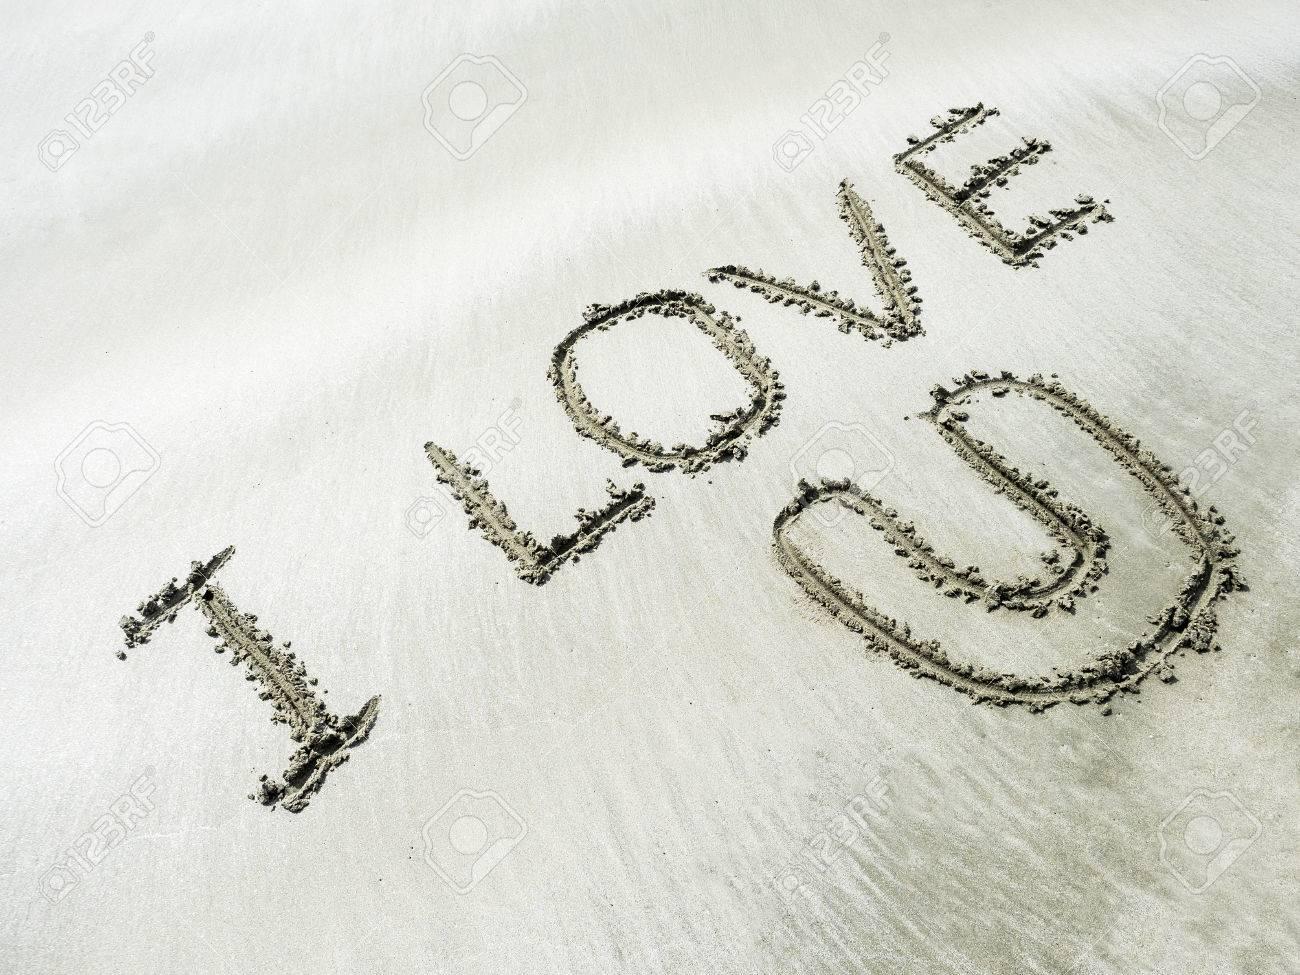 The Word I Love U Writing On White Sand In The Sea Beach Stock